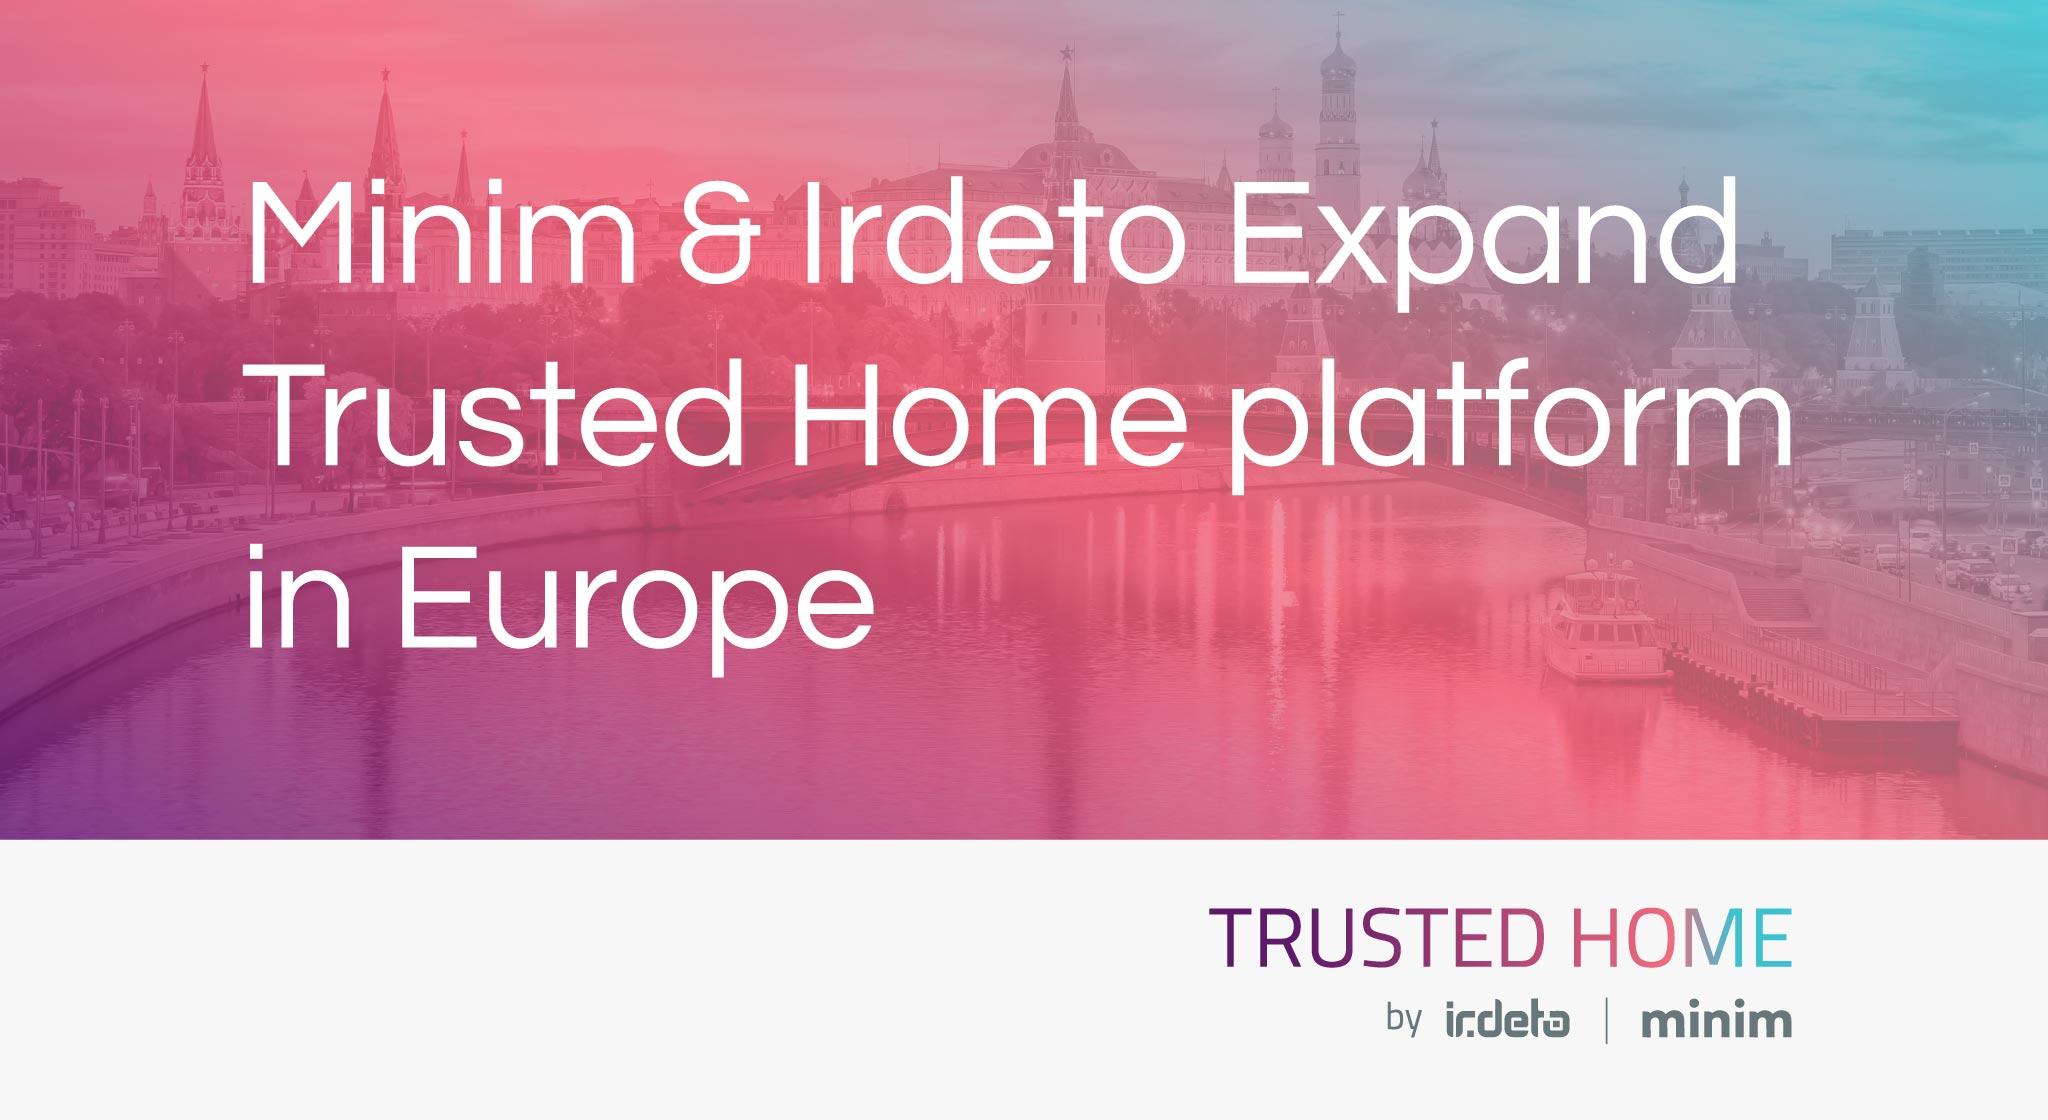 Minim and IrdetoexpandTrusted Home PlatforminEuropeand supportMicroimpuls,Russian IPTV/OTT solutionprovider